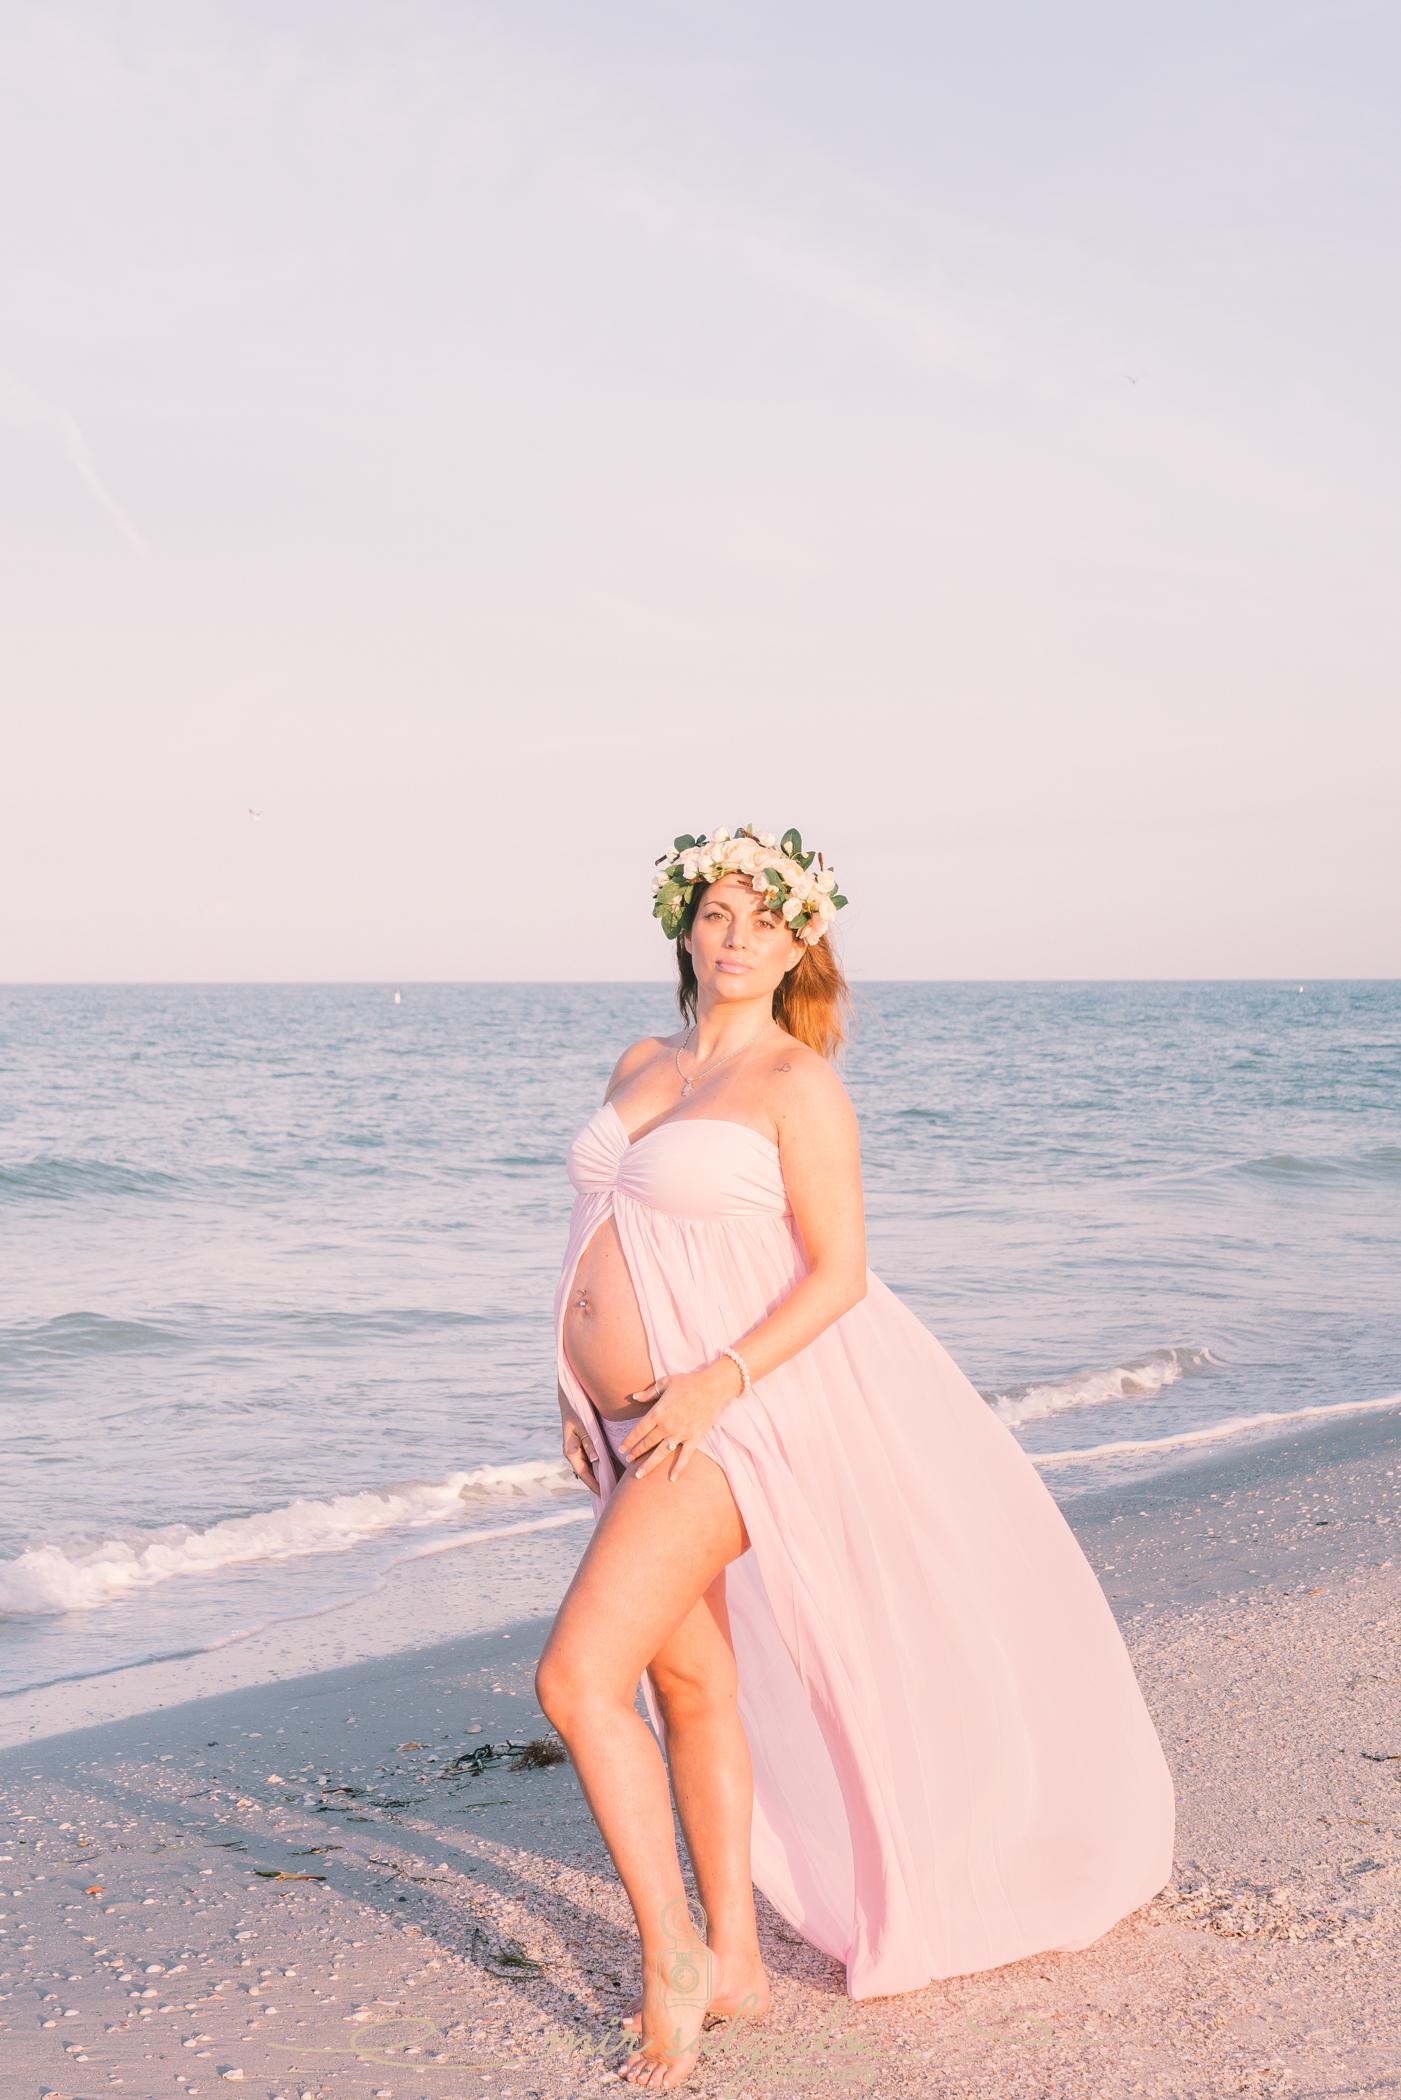 Beach-maternity-session, sunrise-beach-session